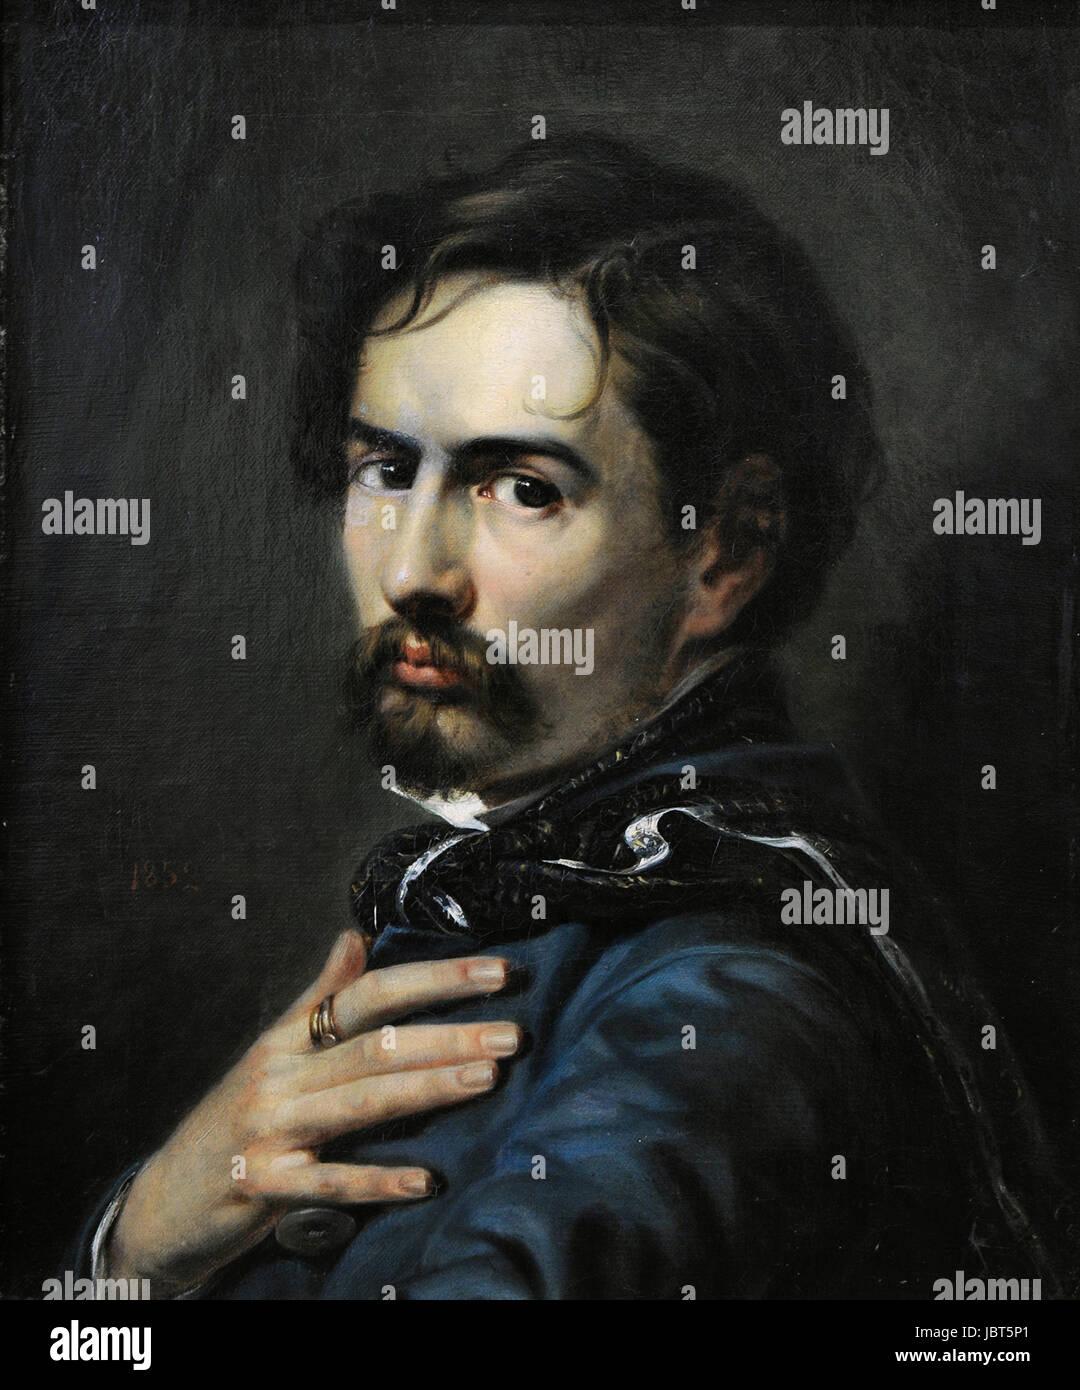 Boleslaw Rusiecki (1824-1913). Self-portrait. Vilnius Picture Gallery. Lithuania. - Stock Image